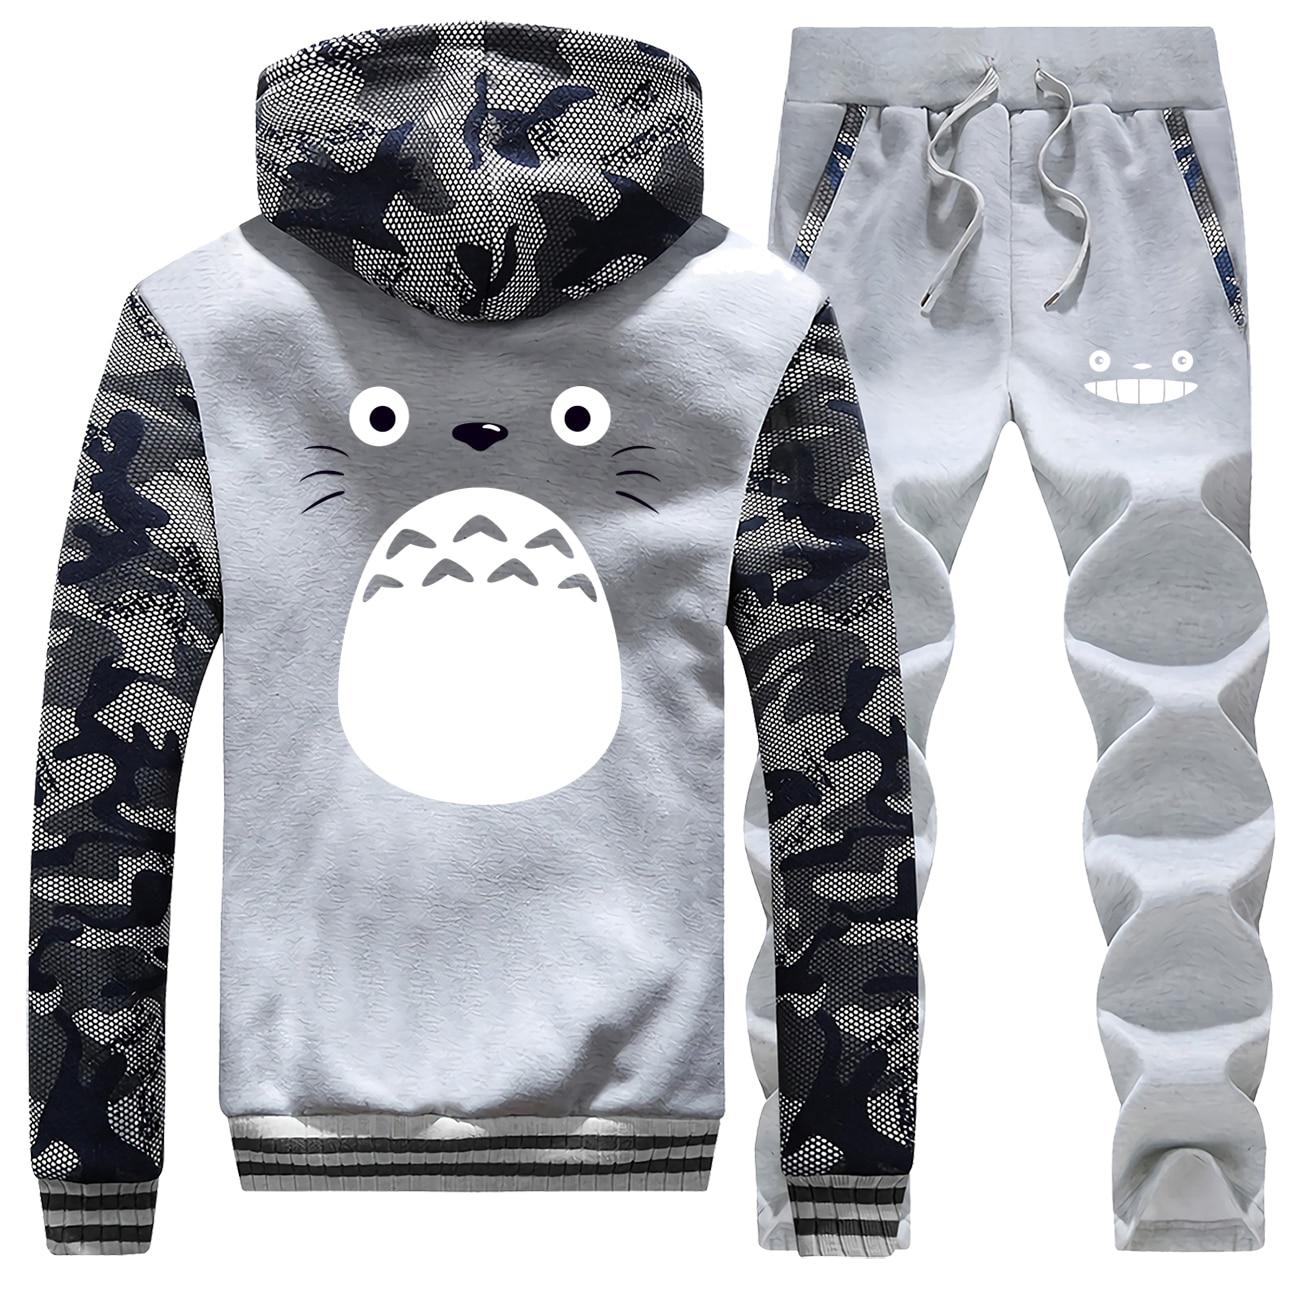 Miyazaki Hayao Cartoon Spirited Away Totoro Men Thick Hoodies Warm Suit Jacket+Pants 2 Piece Sets Studio Ghibli Mens Sweatshirt